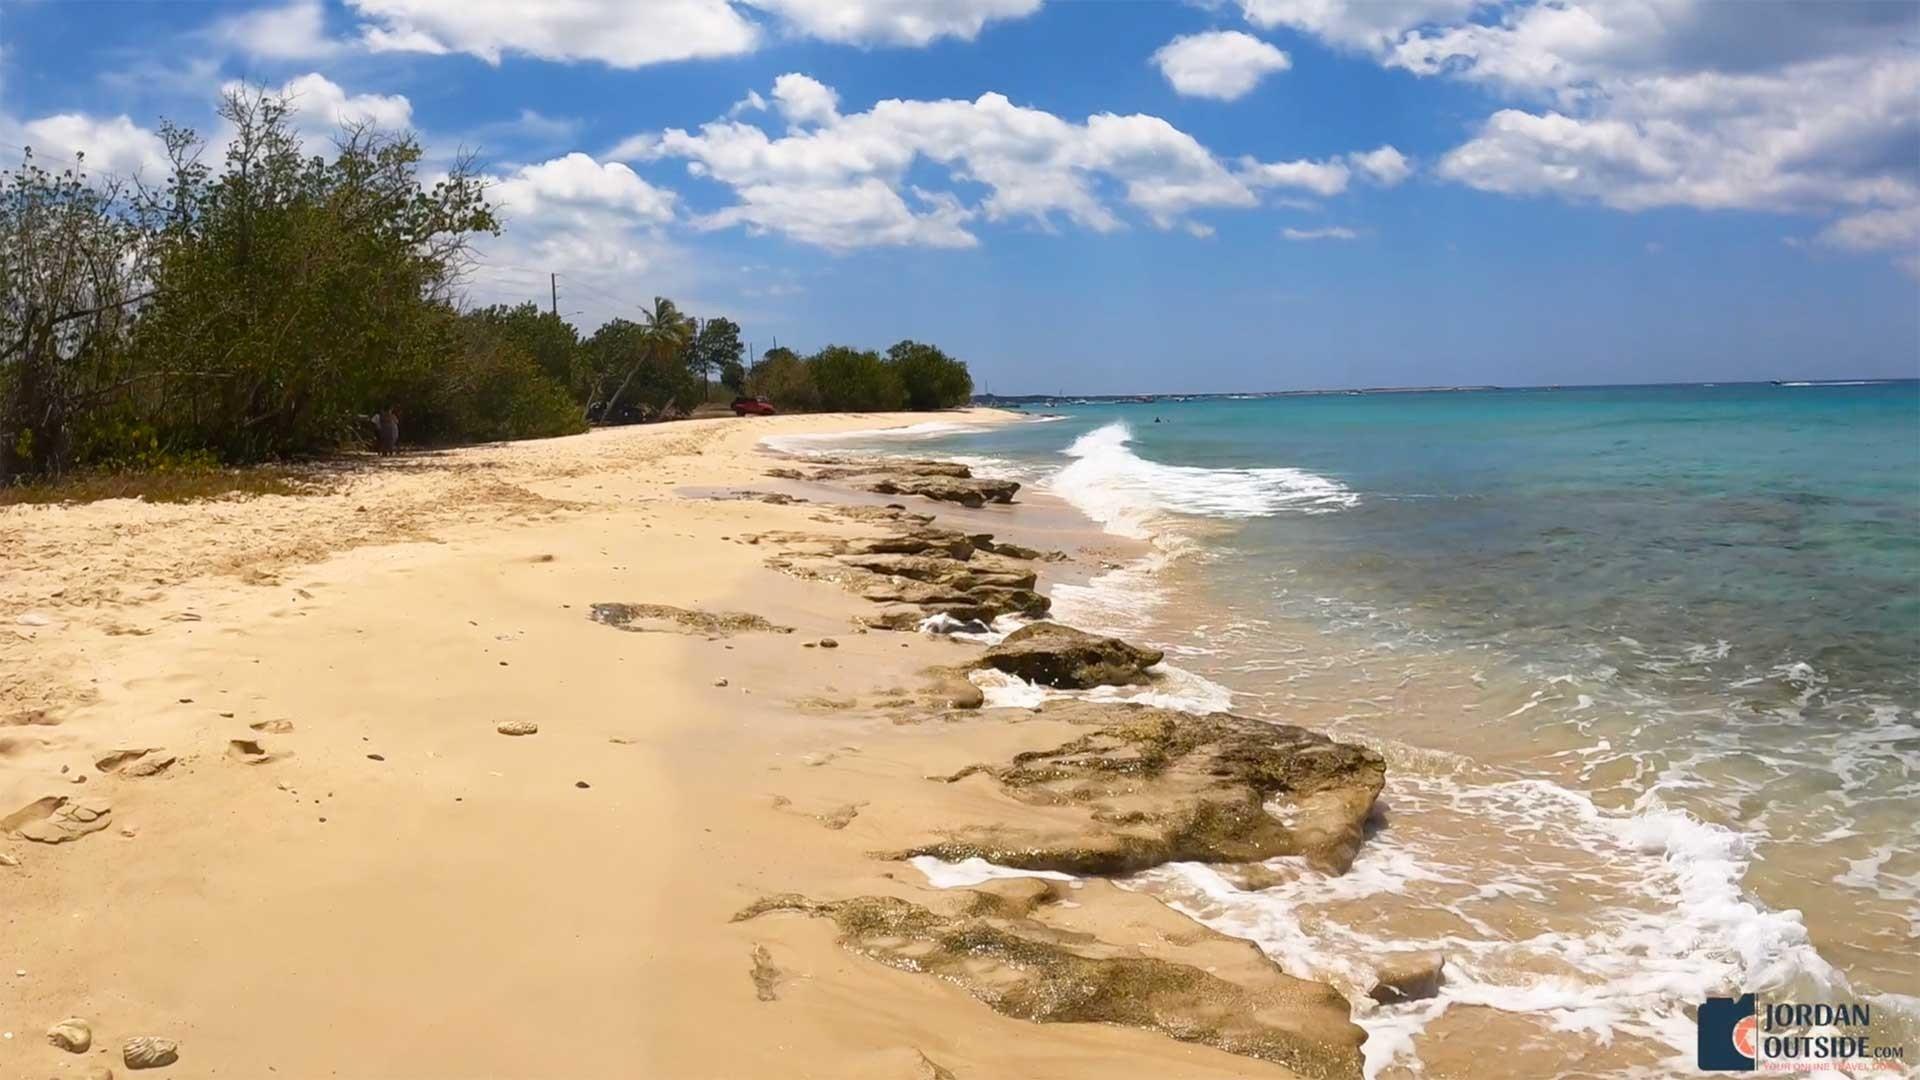 Rocky area on Sprat Hall Beach, St. Croix